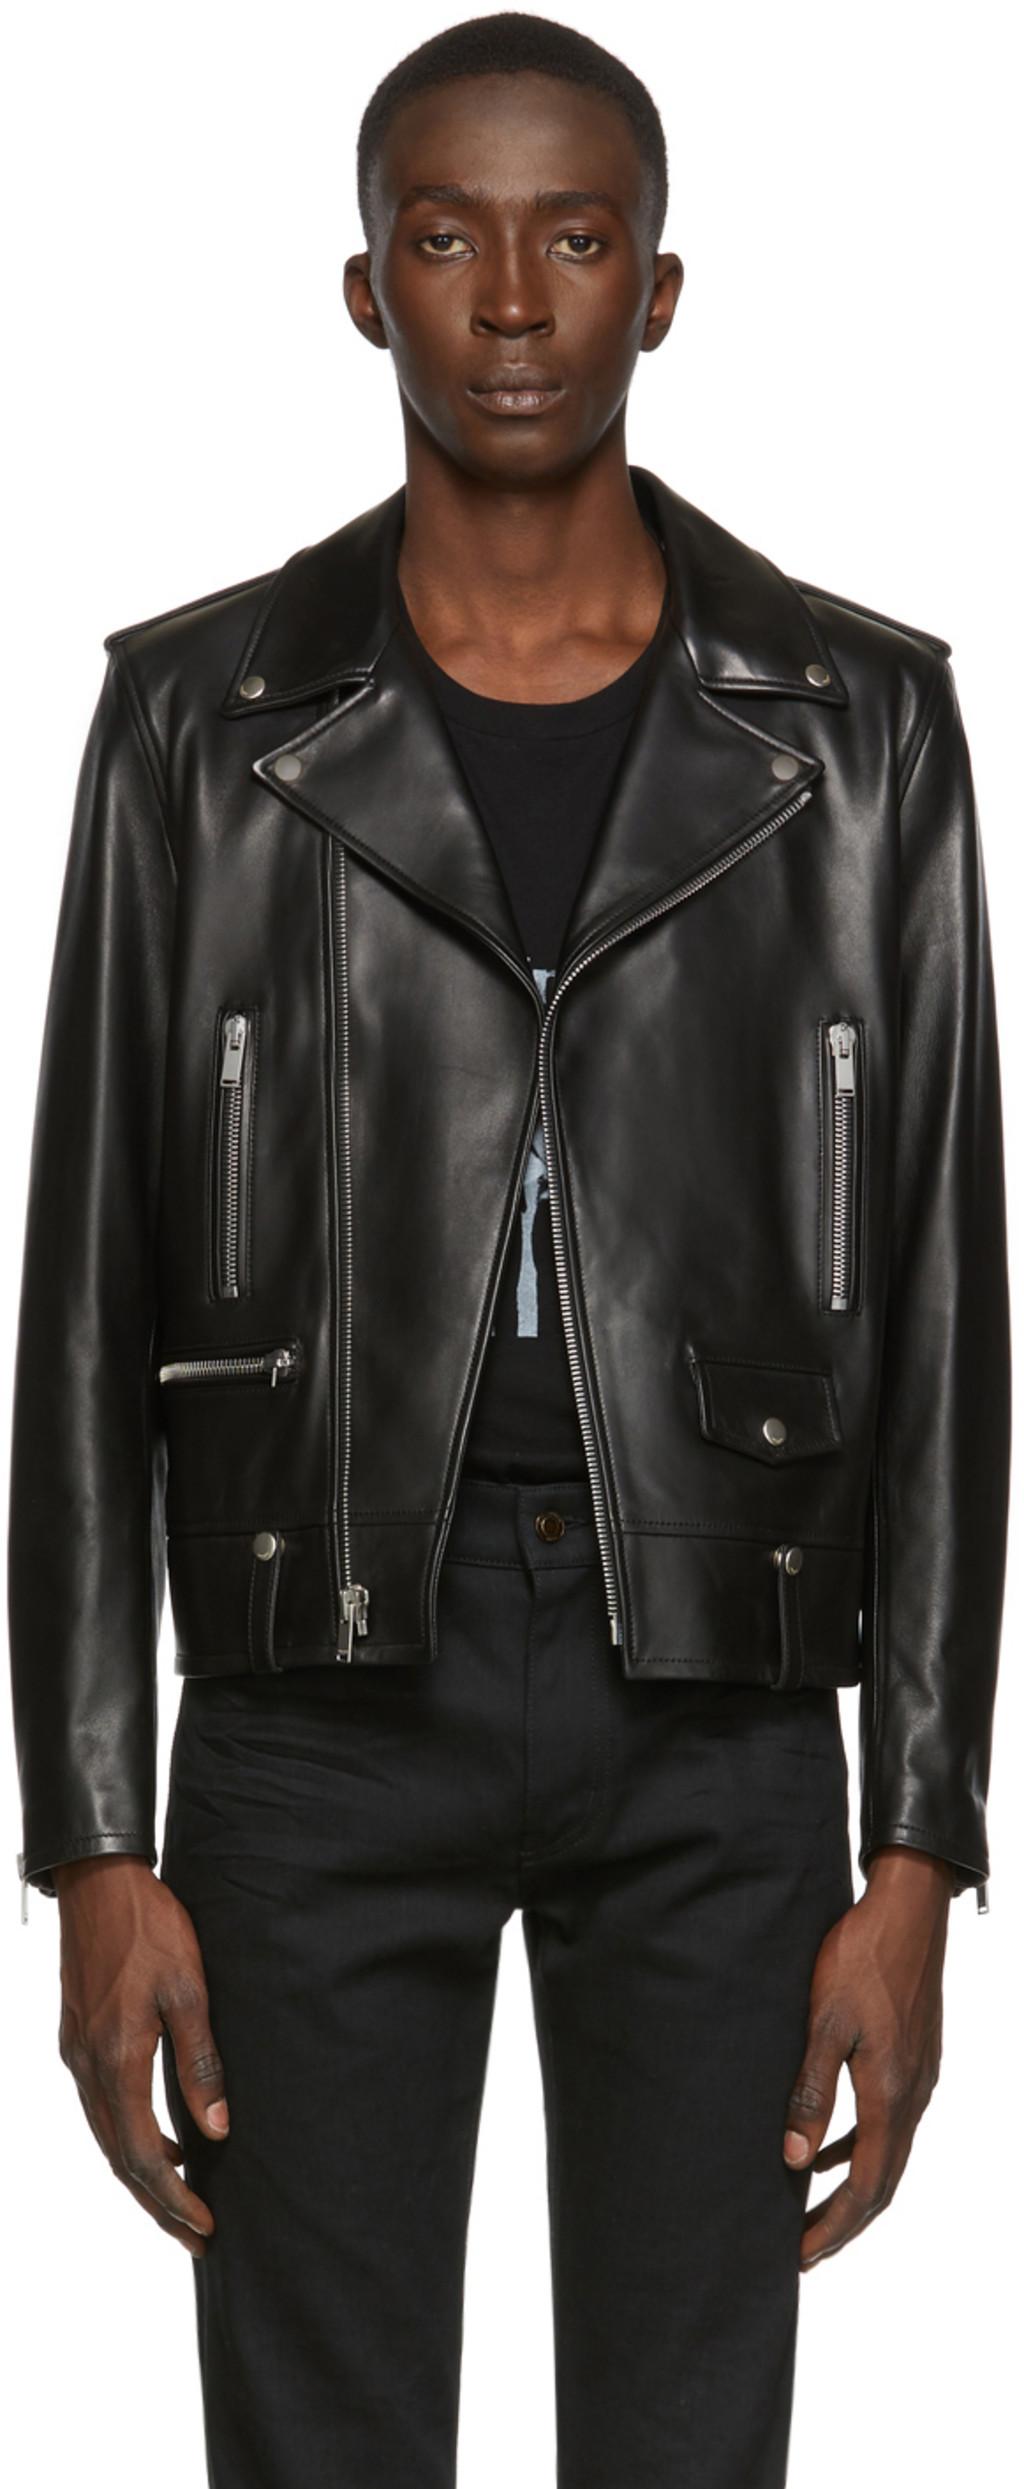 3e3a38a3e8 Black Leather Classic Motorcycle Jacket